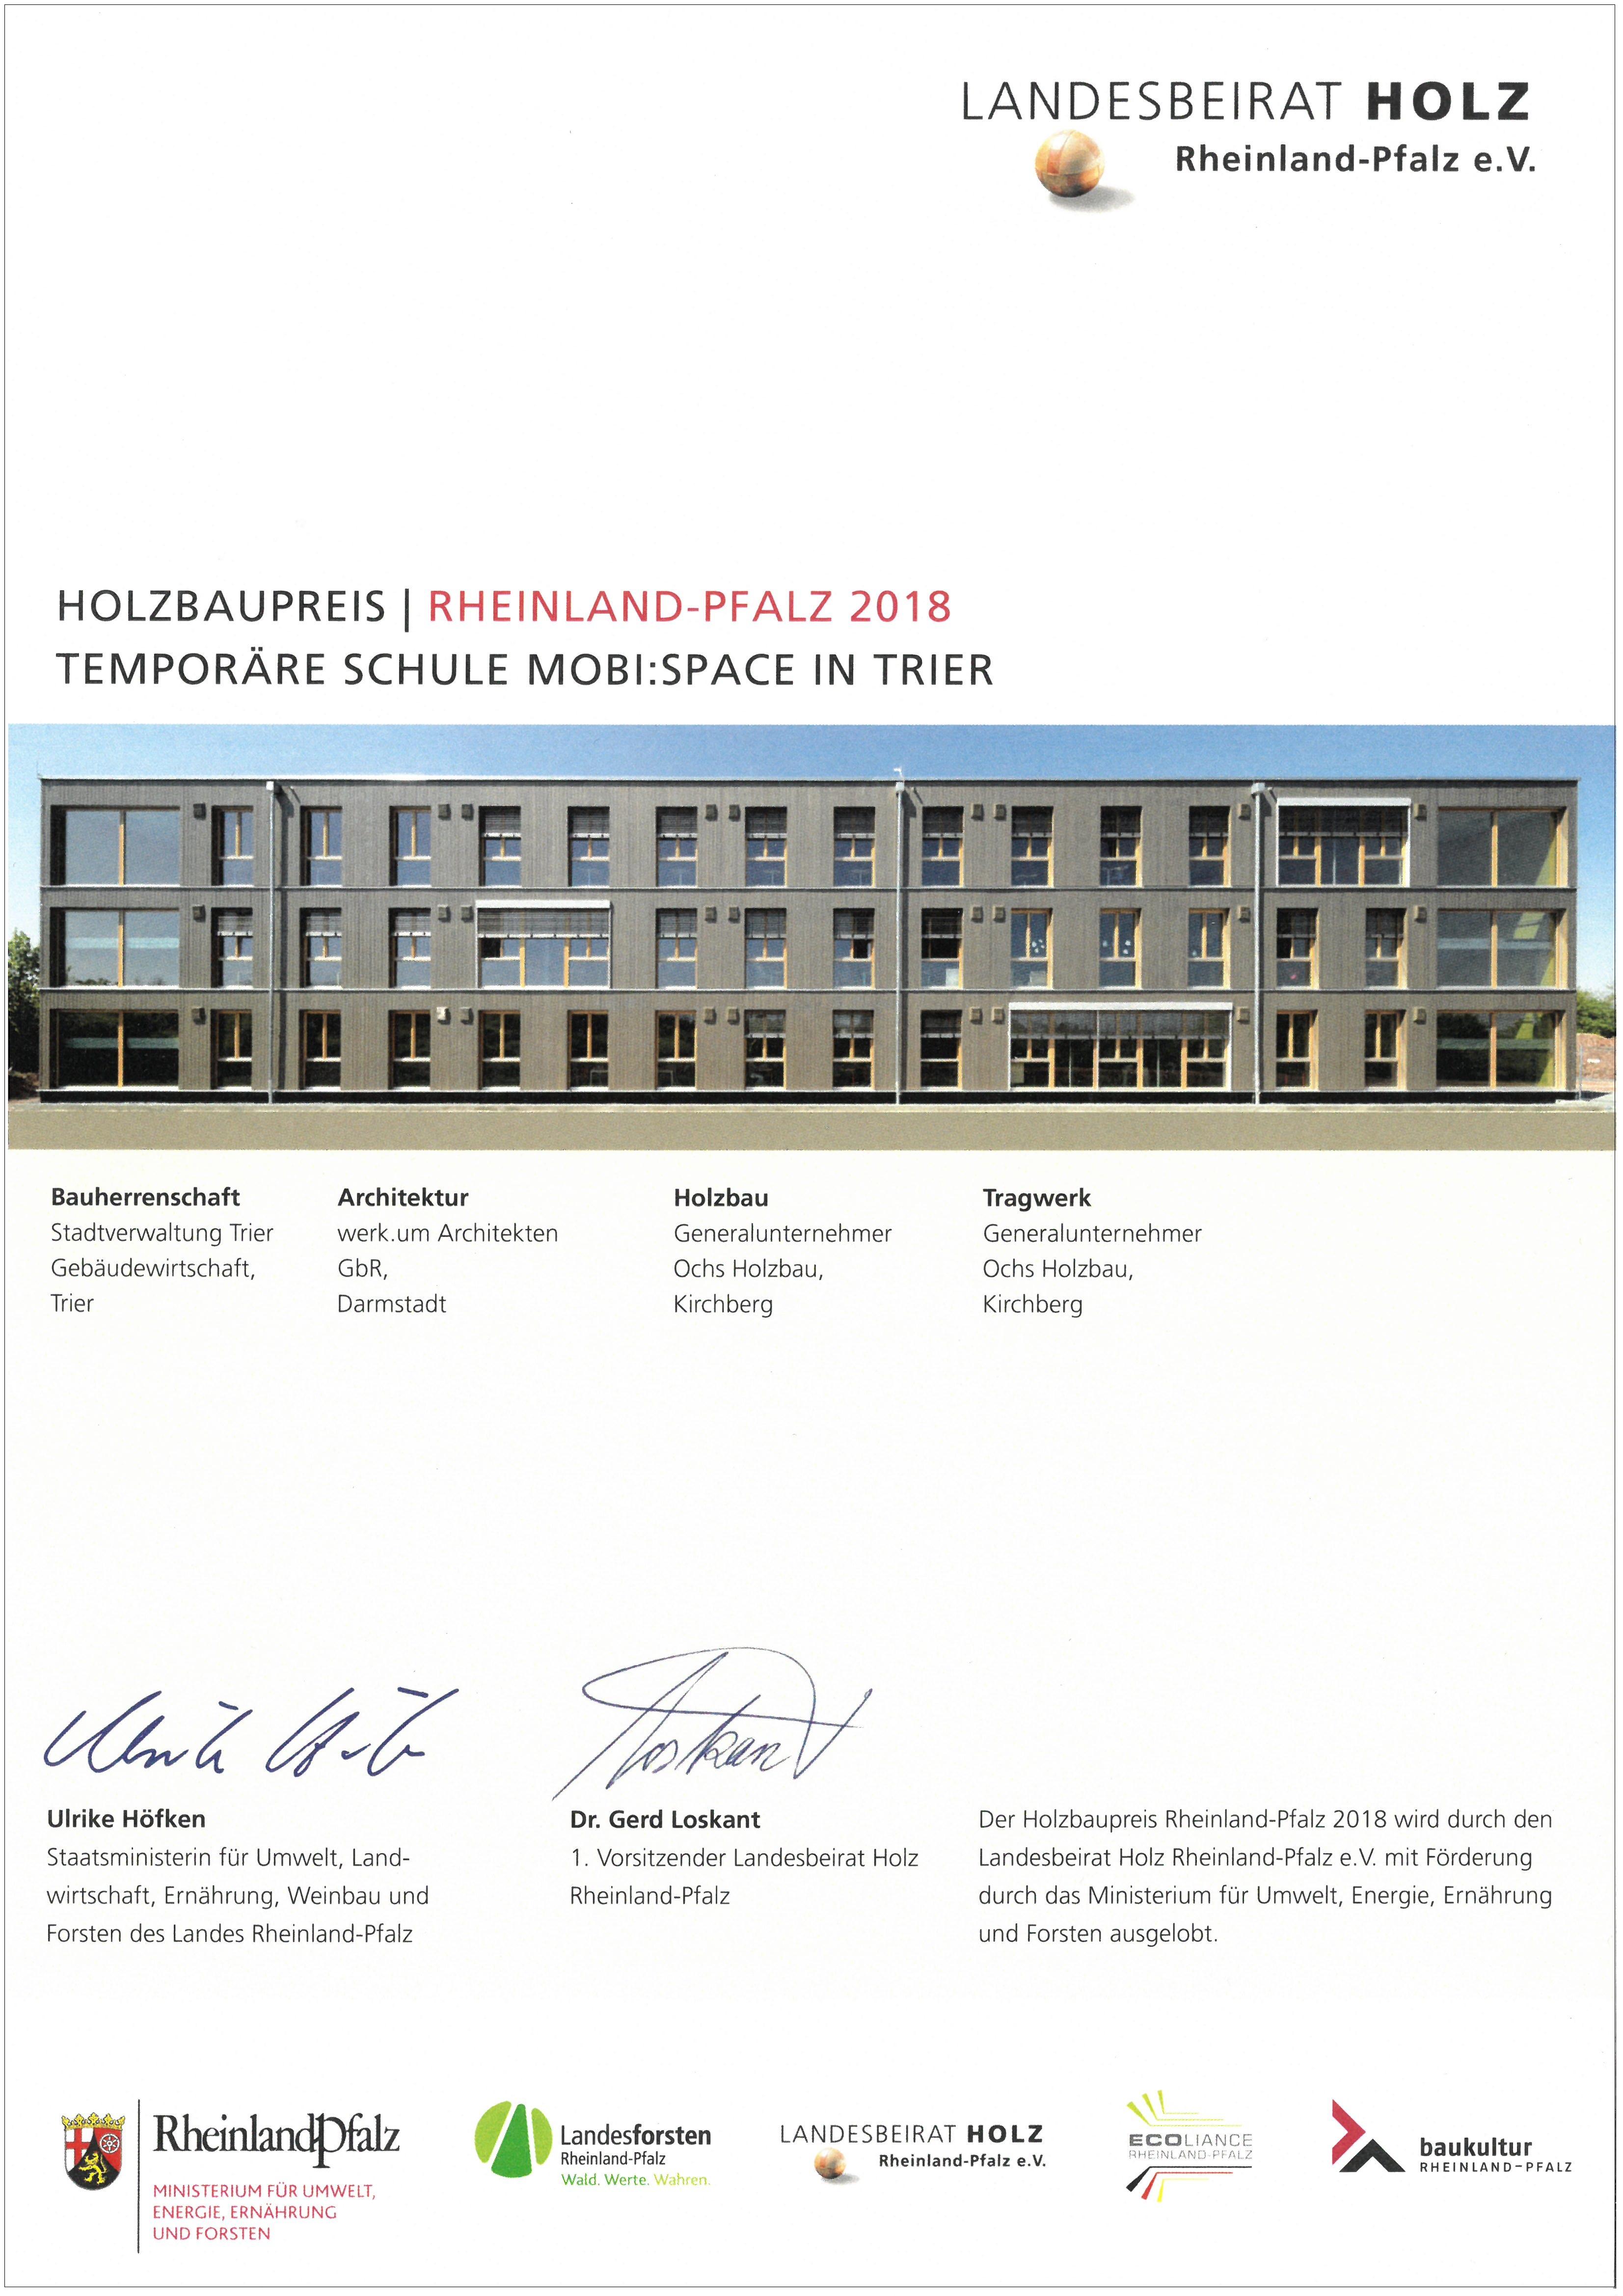 holzbaupreis-rheinland-pfalz-2018